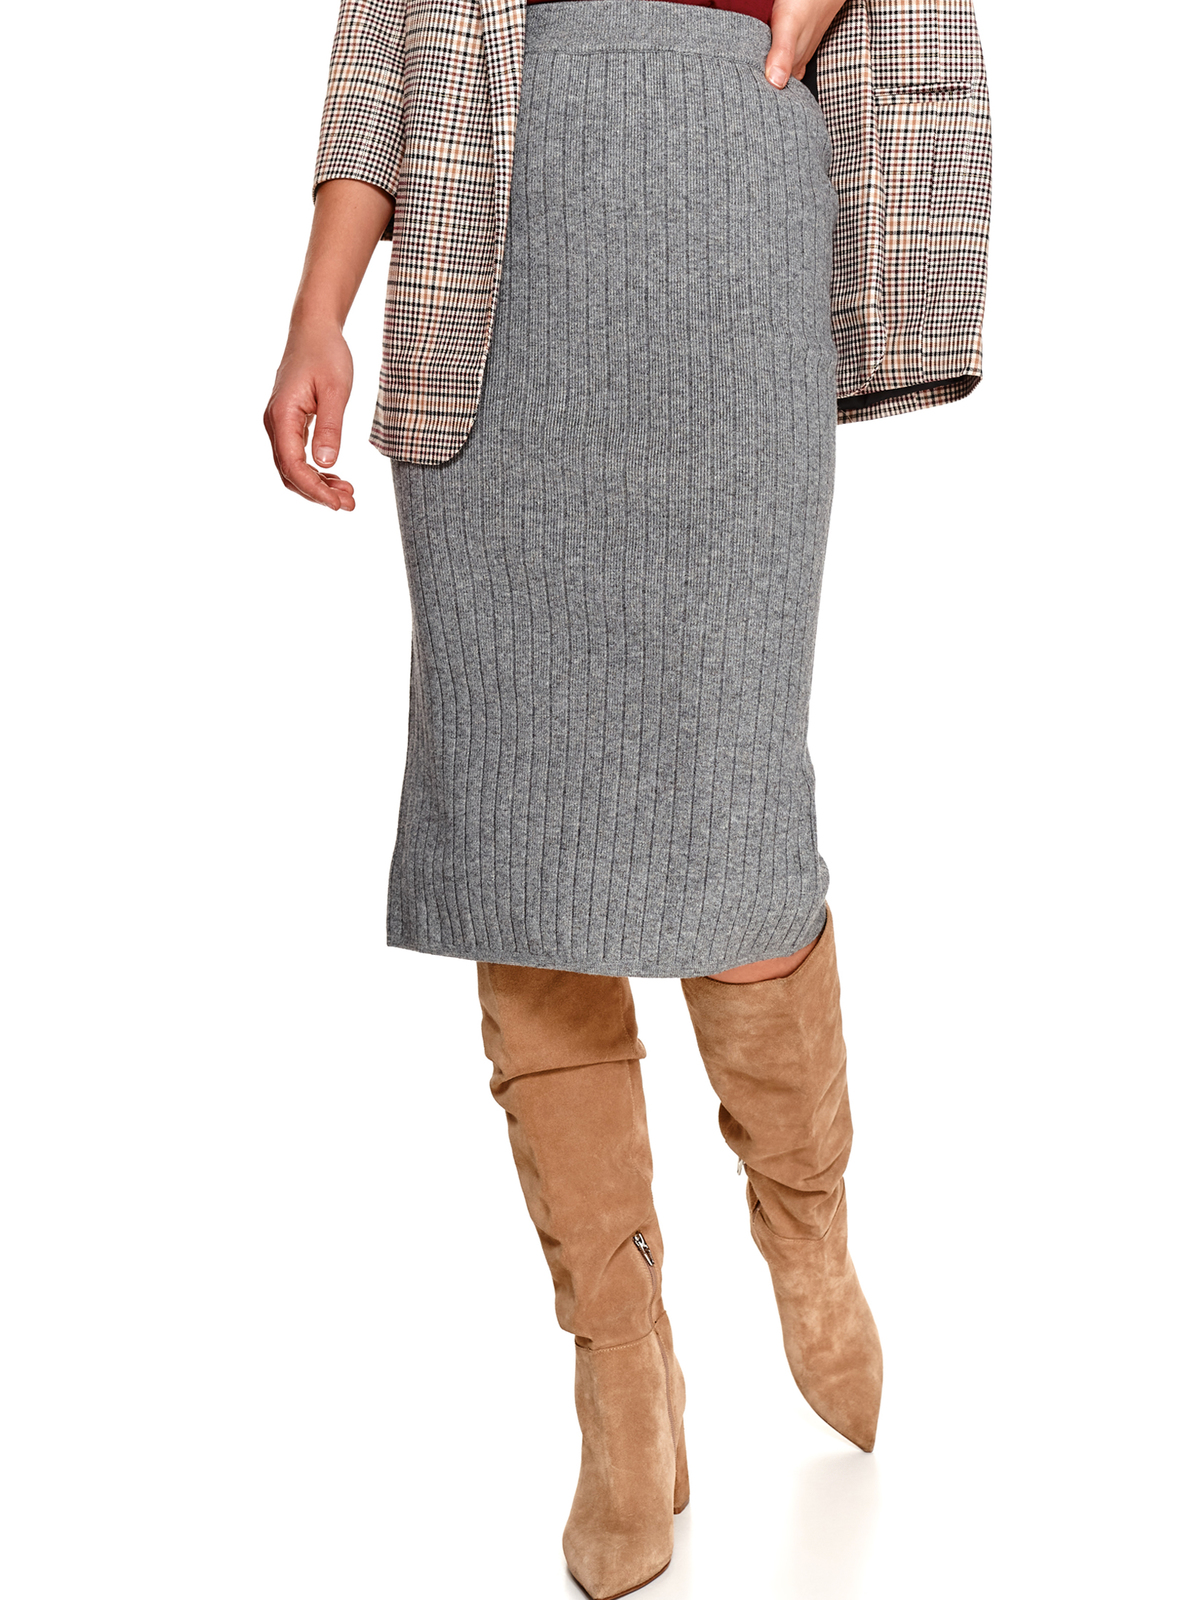 Fusta Top Secret gri midi tip creion cu talie inalta din material tricotat si elastic cu slit la spate